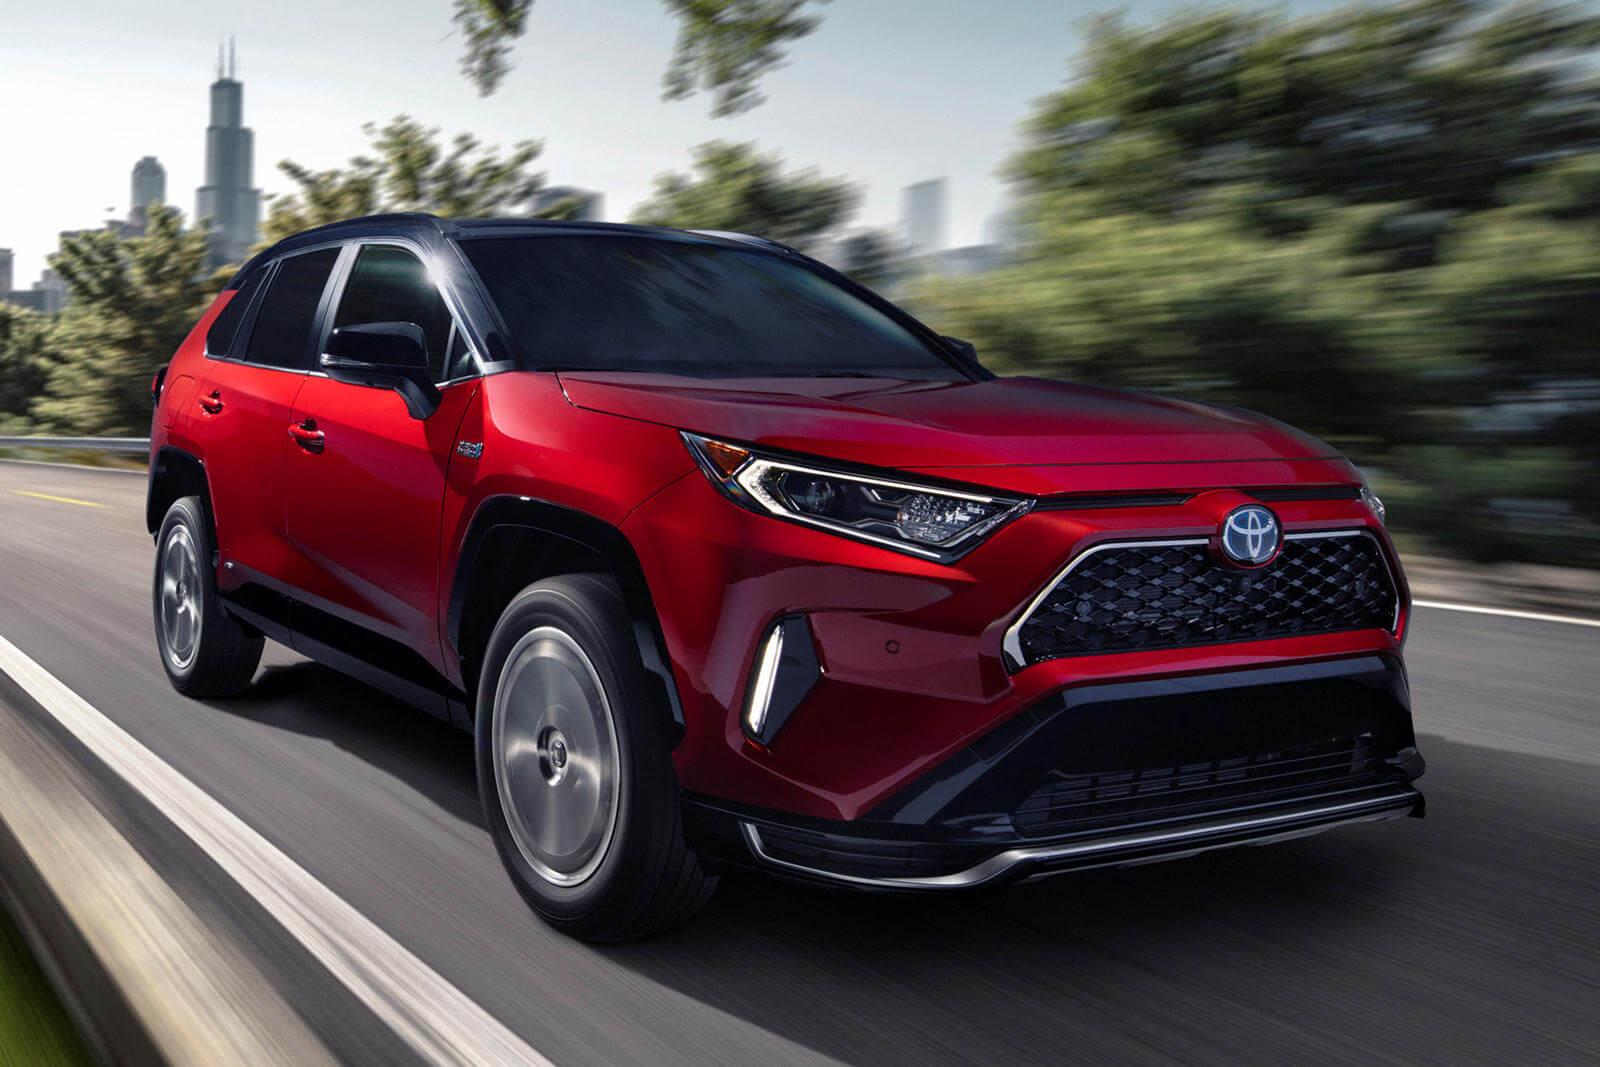 Toyota CEO'sunun elektrikli otomobillere sert sözleri